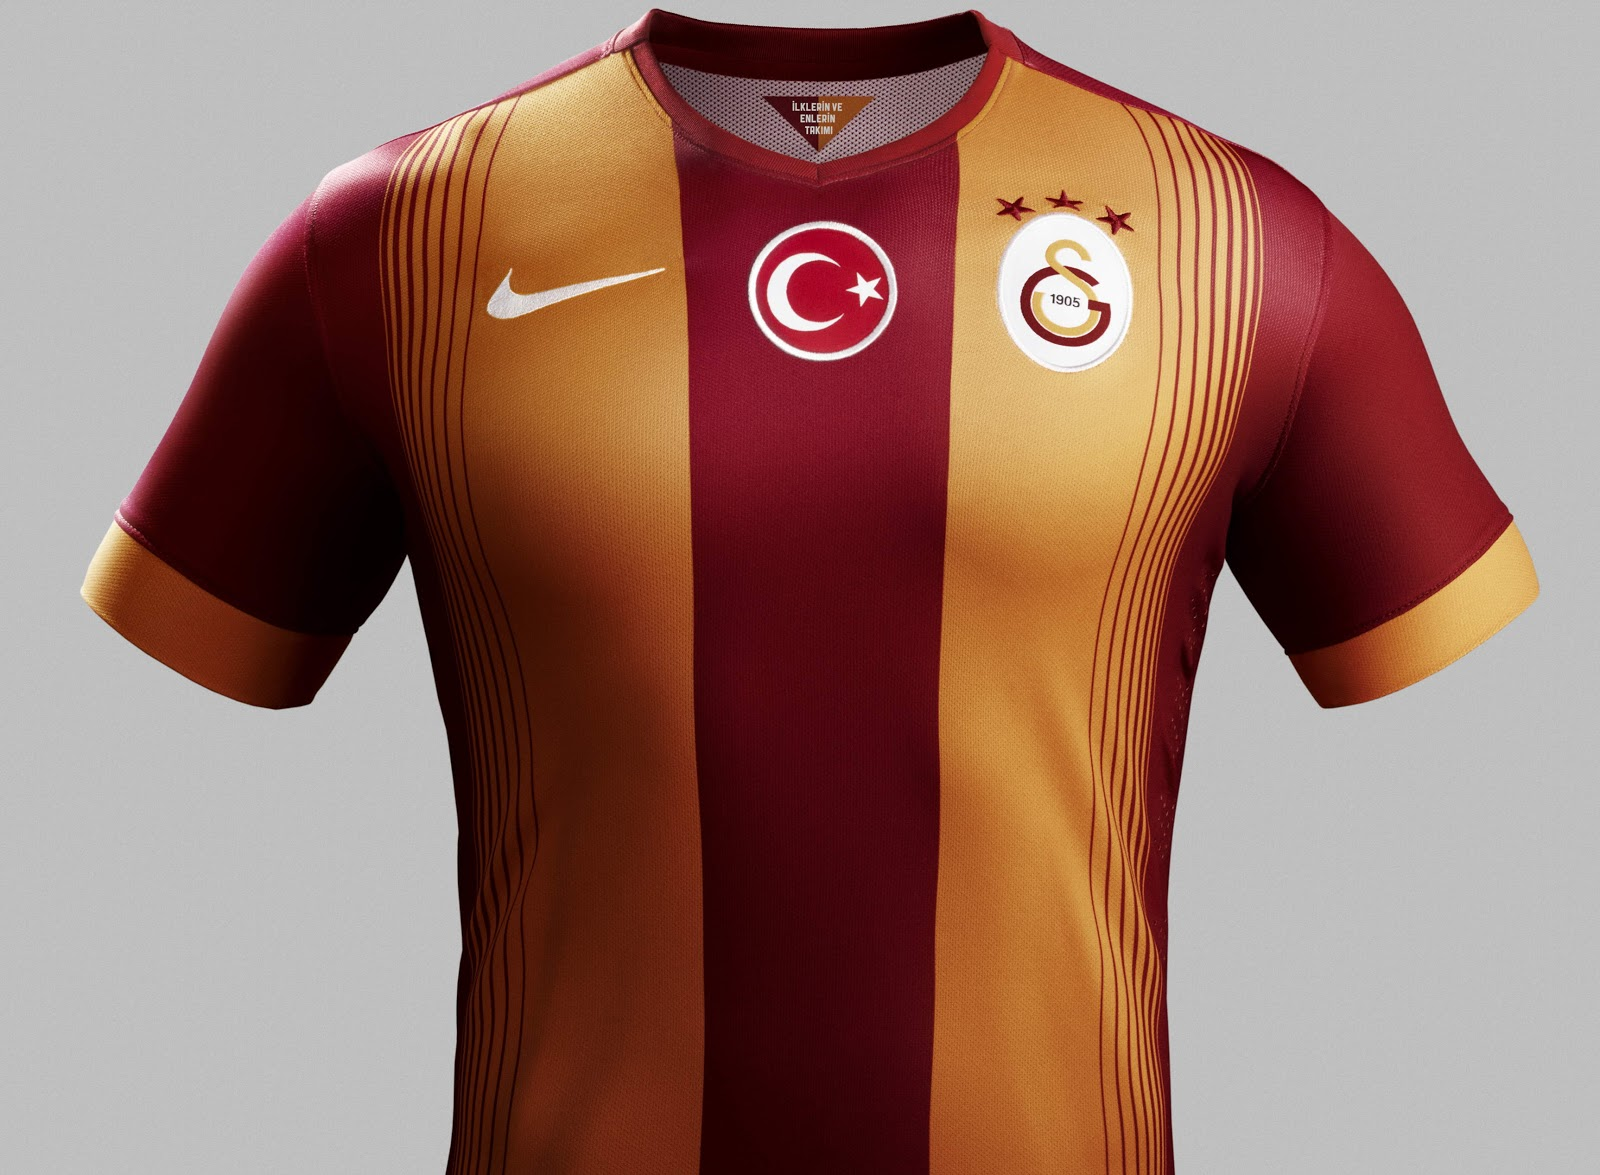 http://1.bp.blogspot.com/-jT9d5Q9MZuI/U8jcRZTPxRI/AAAAAAAAUYY/PbWQN6JRyvU/s1600/Nike-Galatasaray-14-15-Home-Kit+(1).jpg